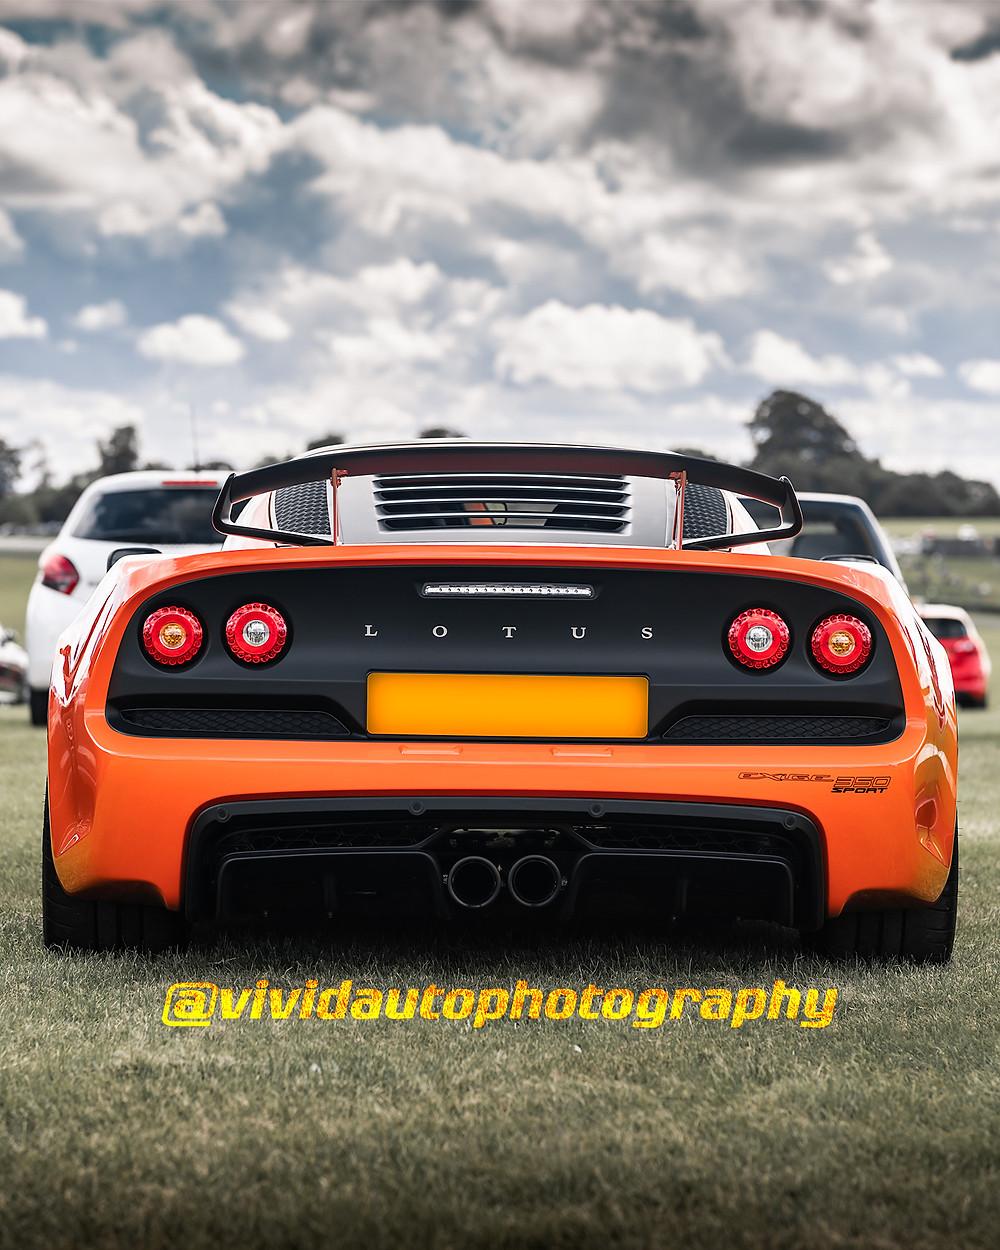 Lotus Exige Sport 350 | Signature Orange | Oulton Park